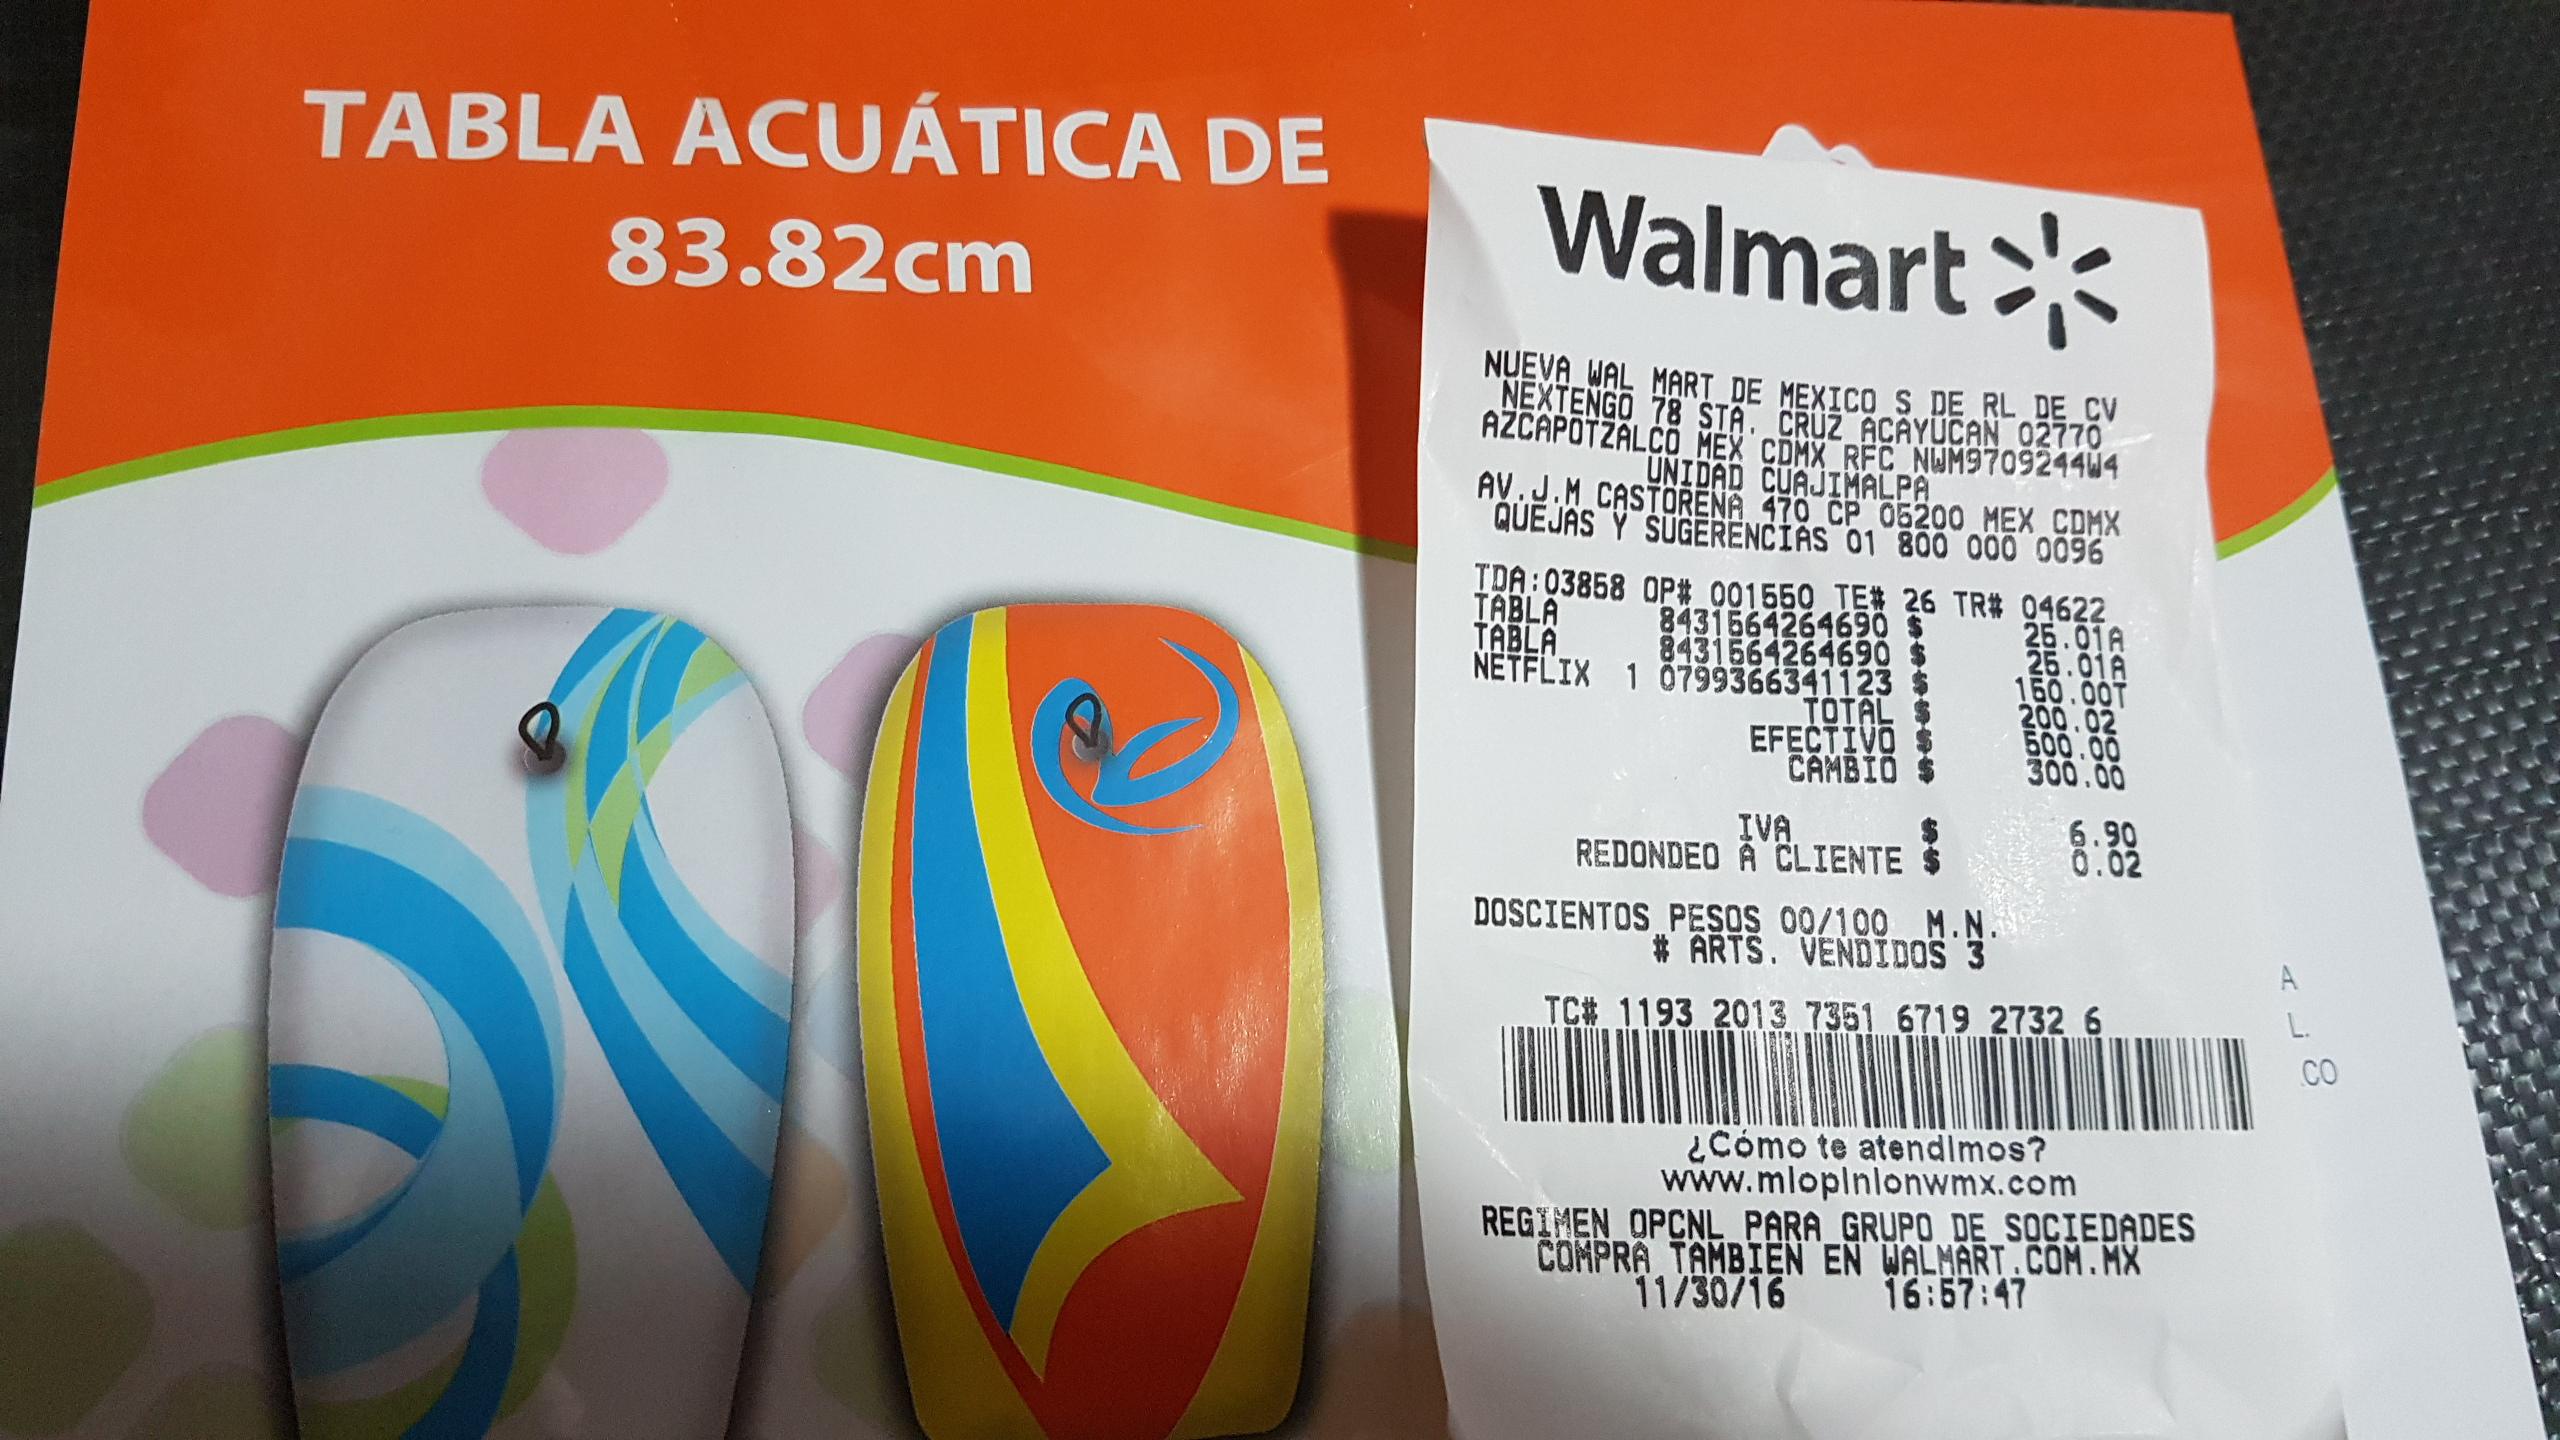 Walmart Cuajimalpa: Tabla Acuatica 83cm a $25.01